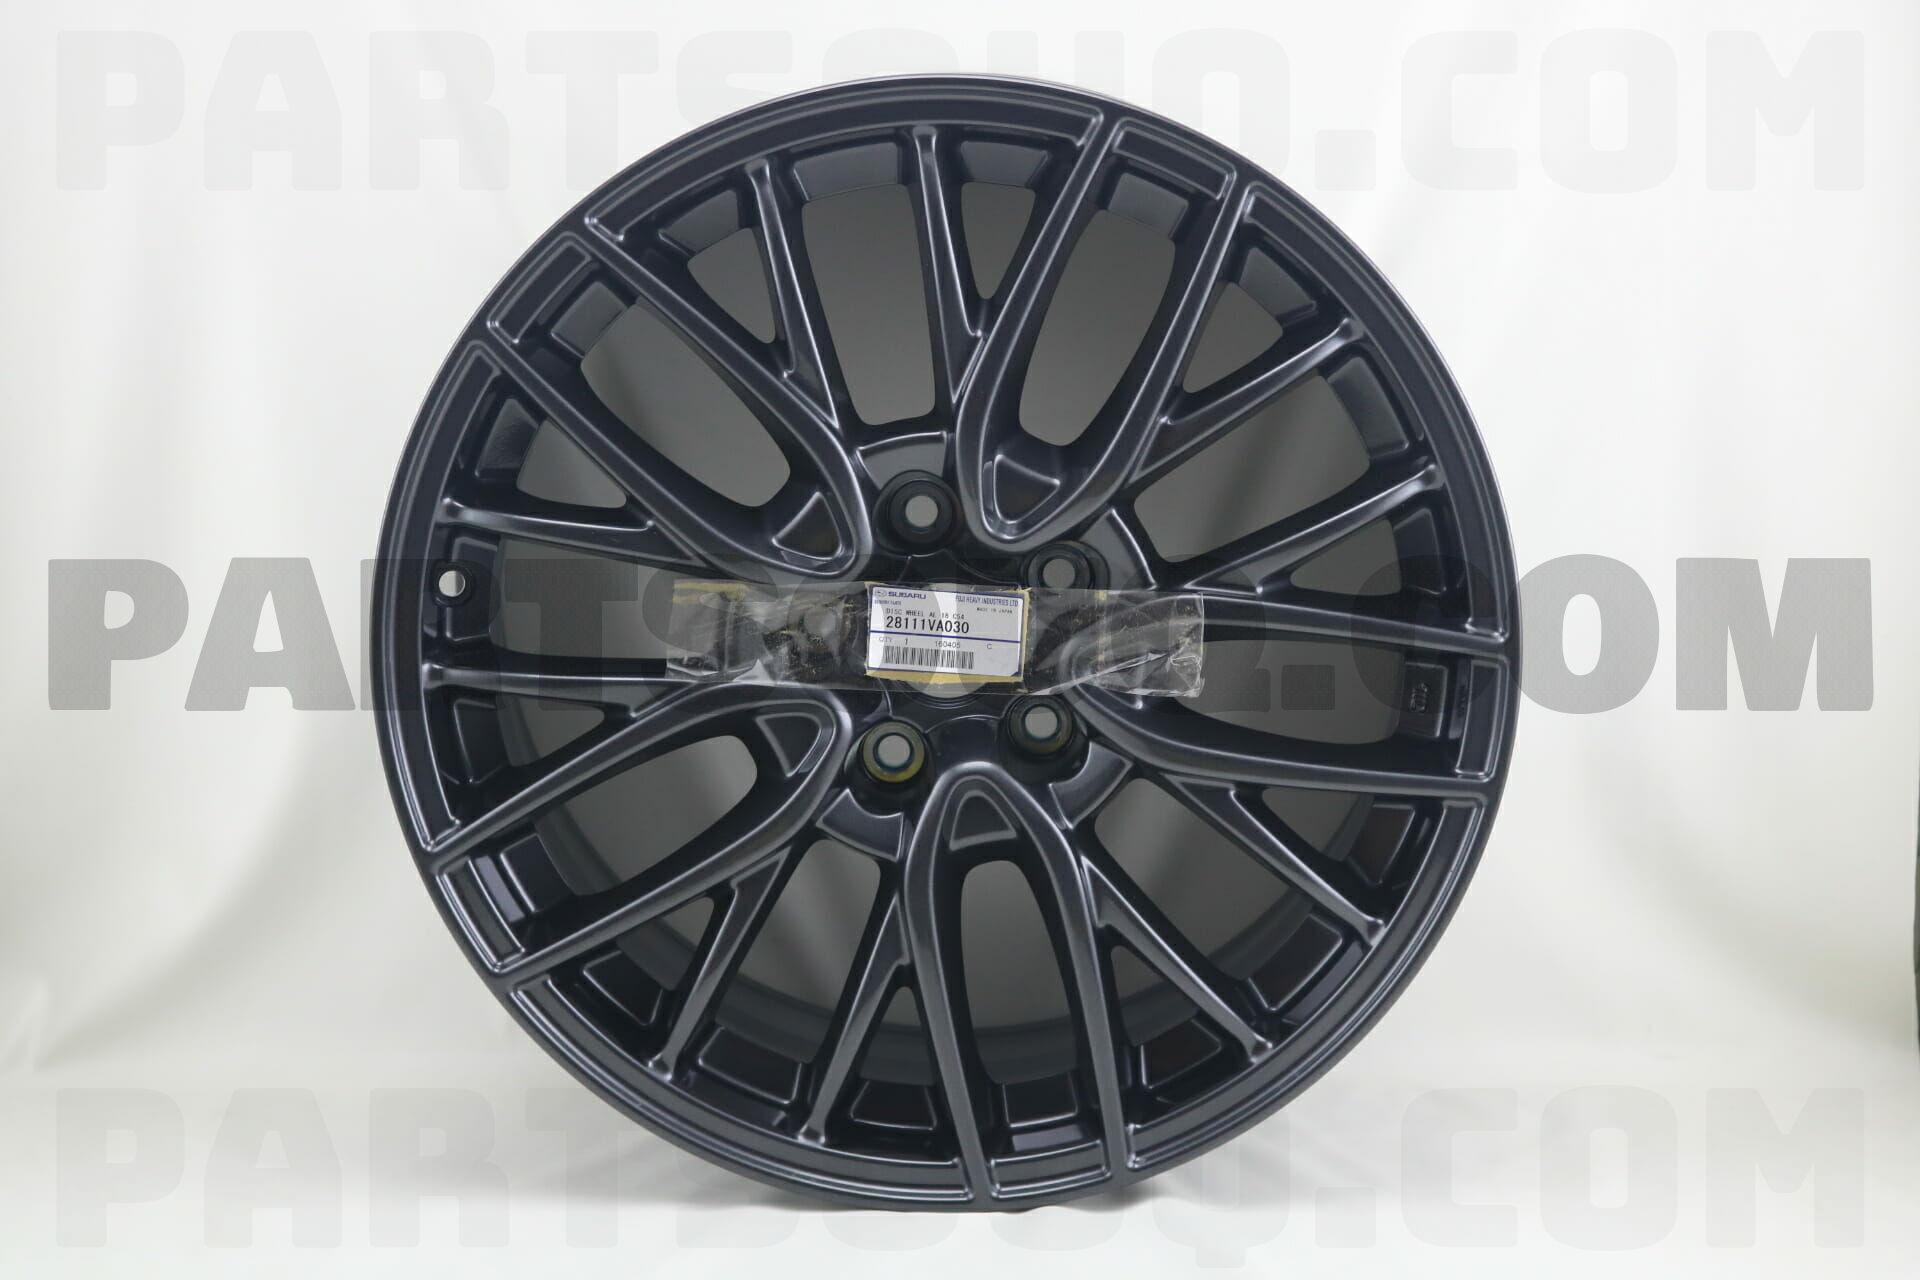 28111va030 Subaru Disc Wheel Al 18 C54  Price  371 69   Weight  12 59kg - Partsouq